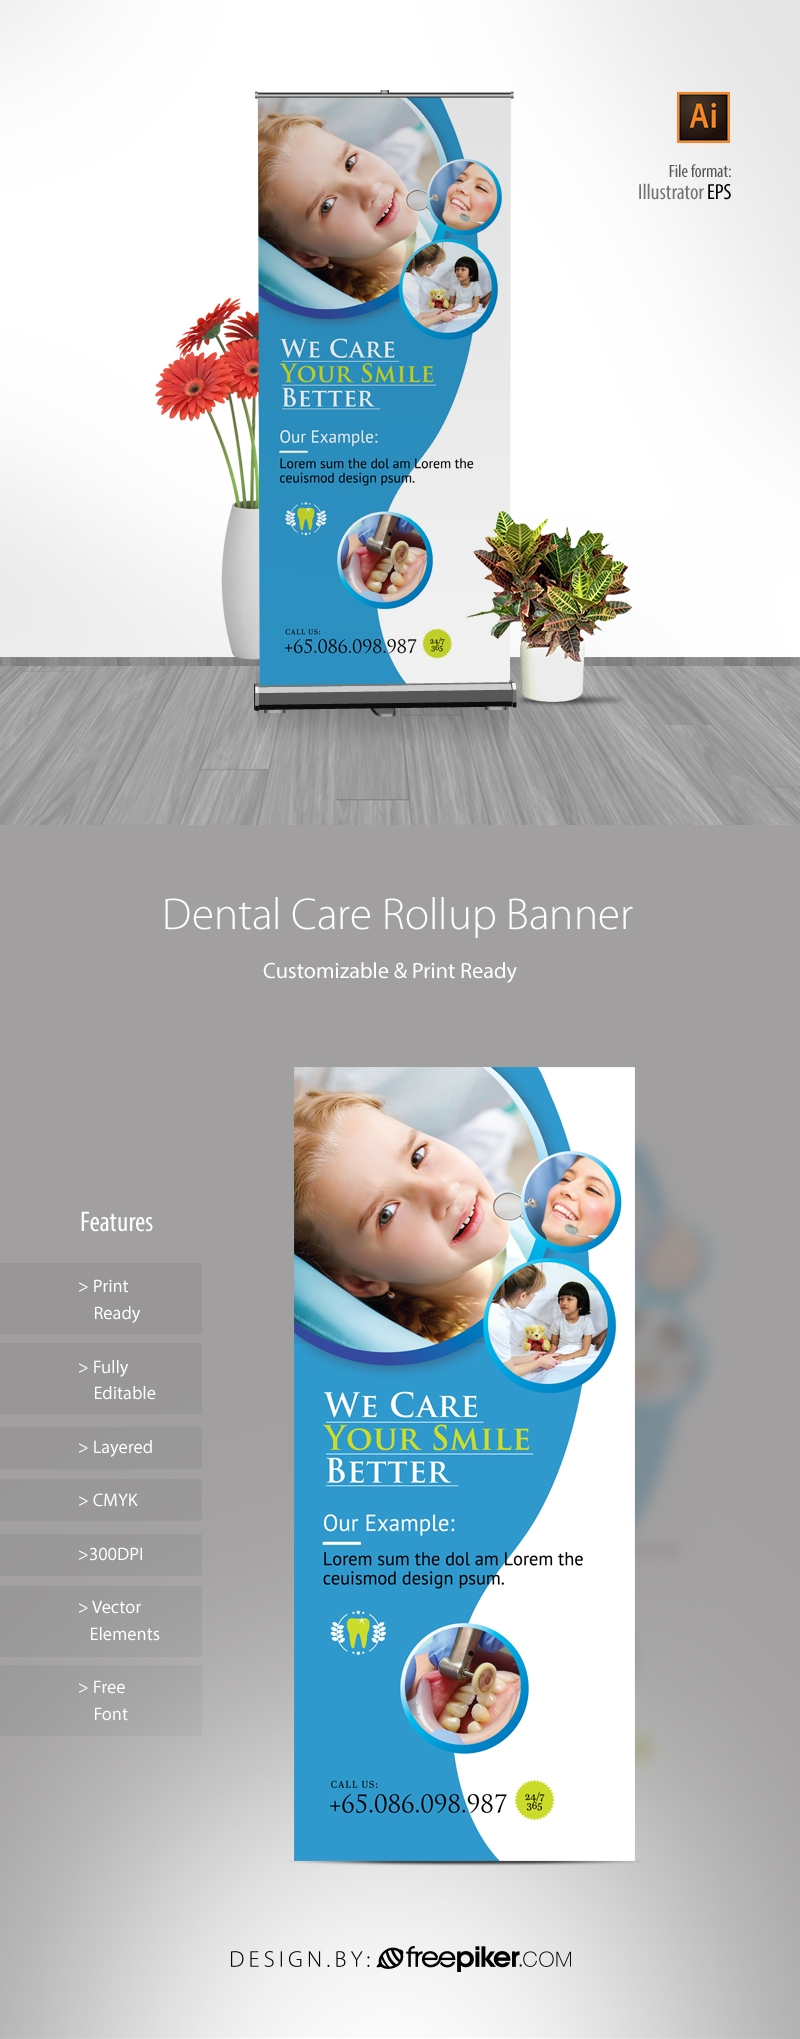 Dental Care Rollup Banner